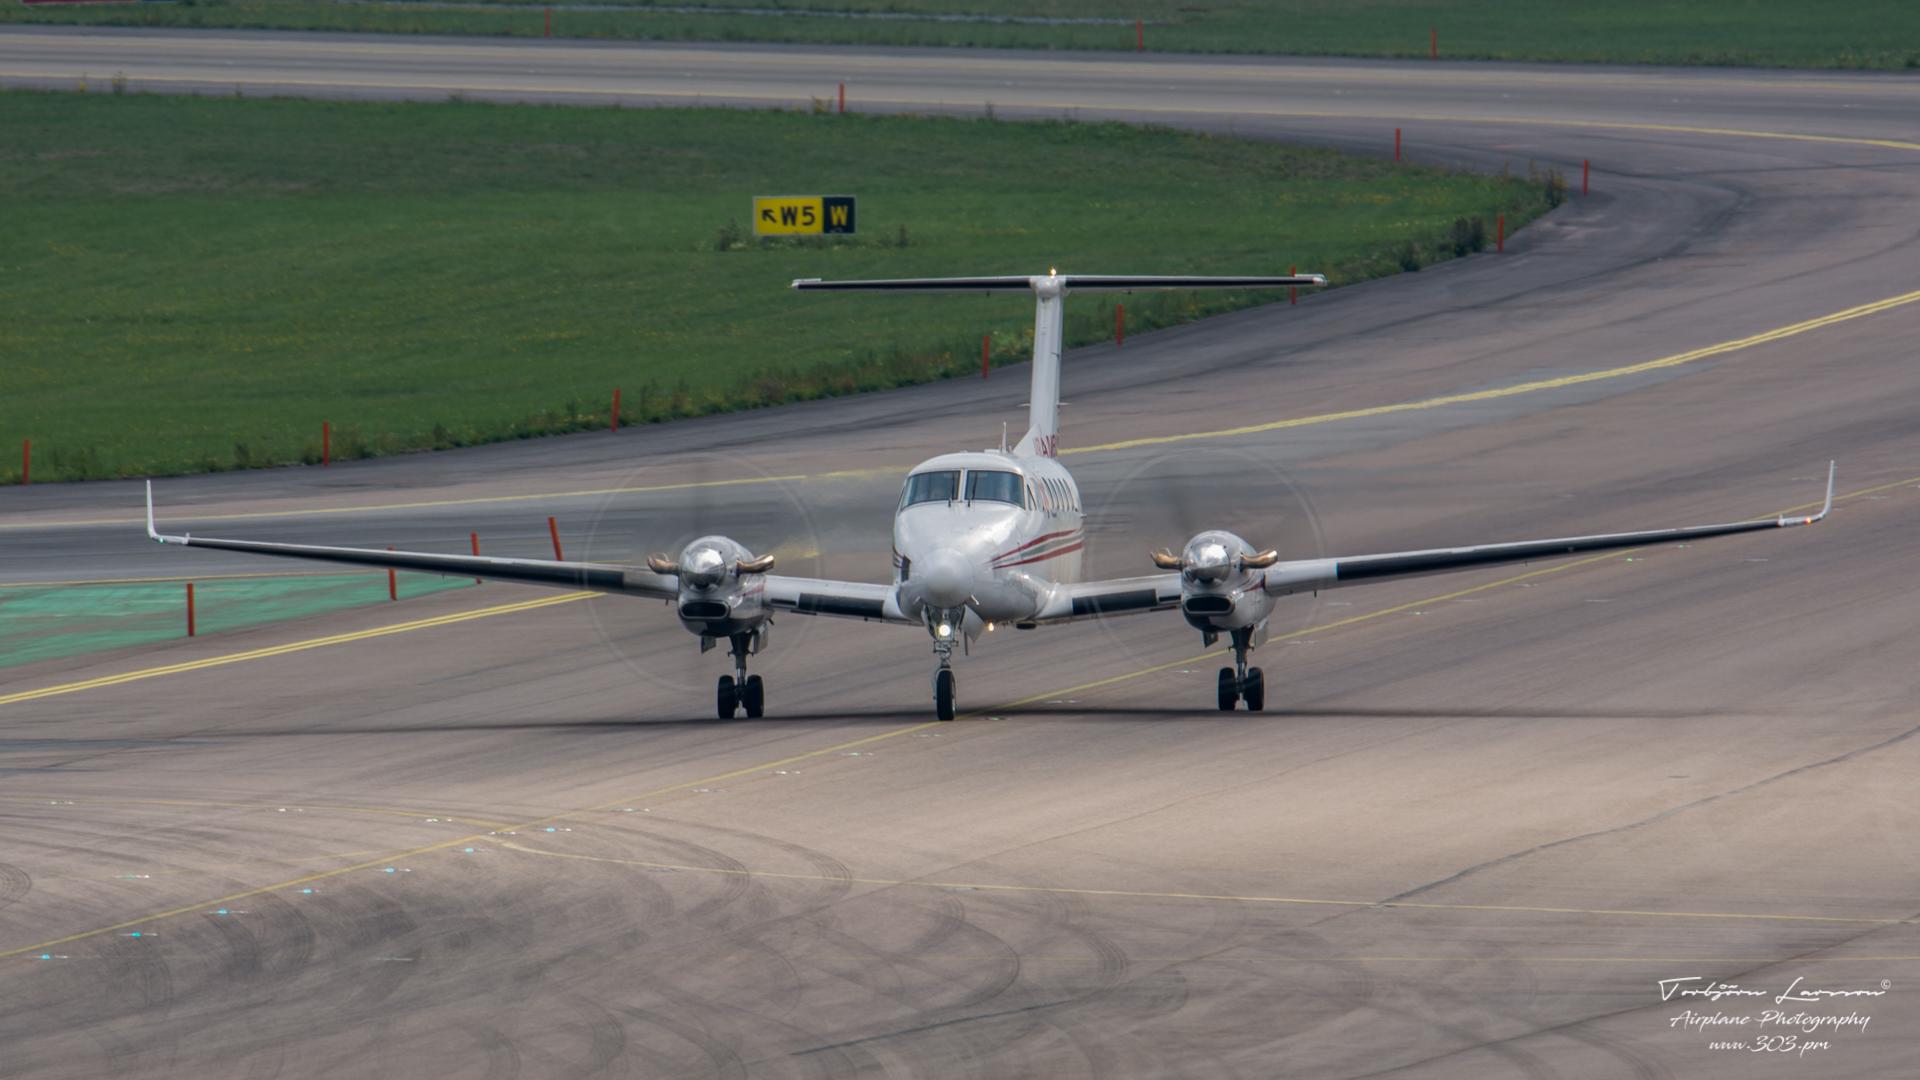 Beech King Air 300 - Air Ambulance - SE-KOL - TBE_2005